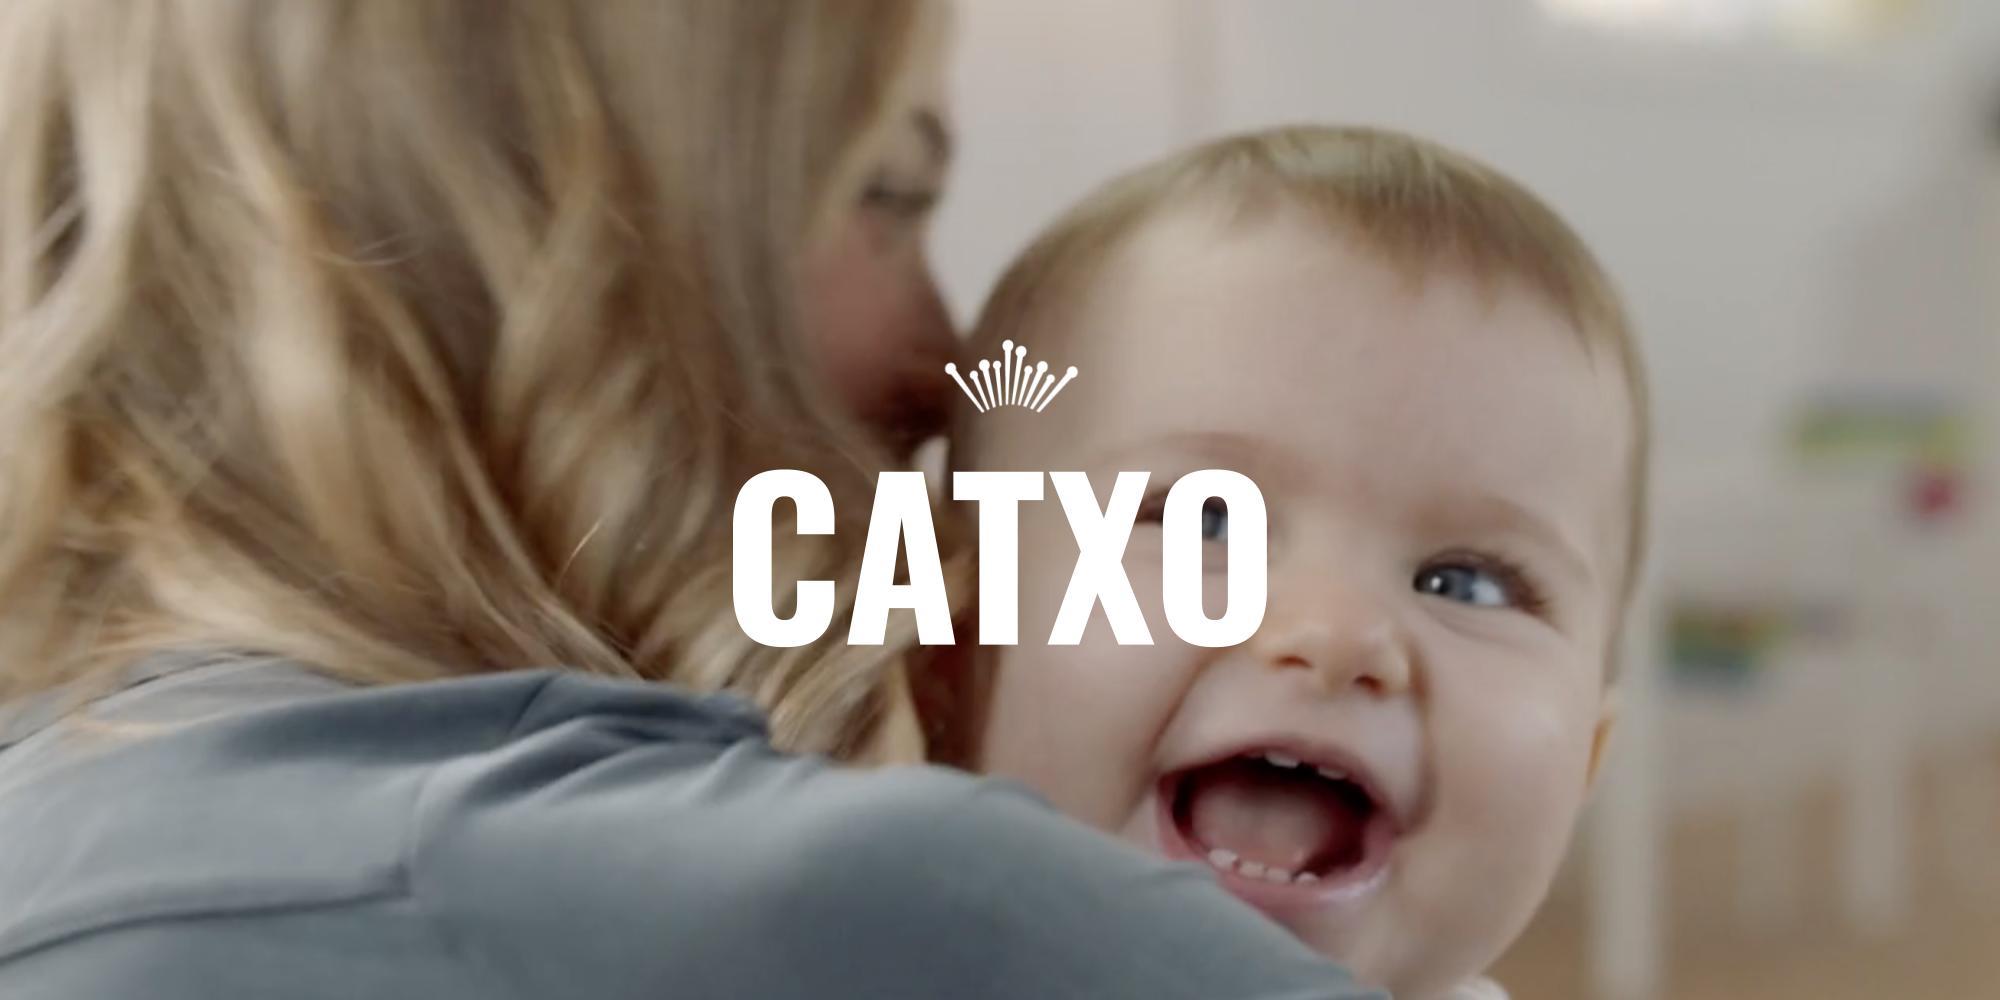 CATXO